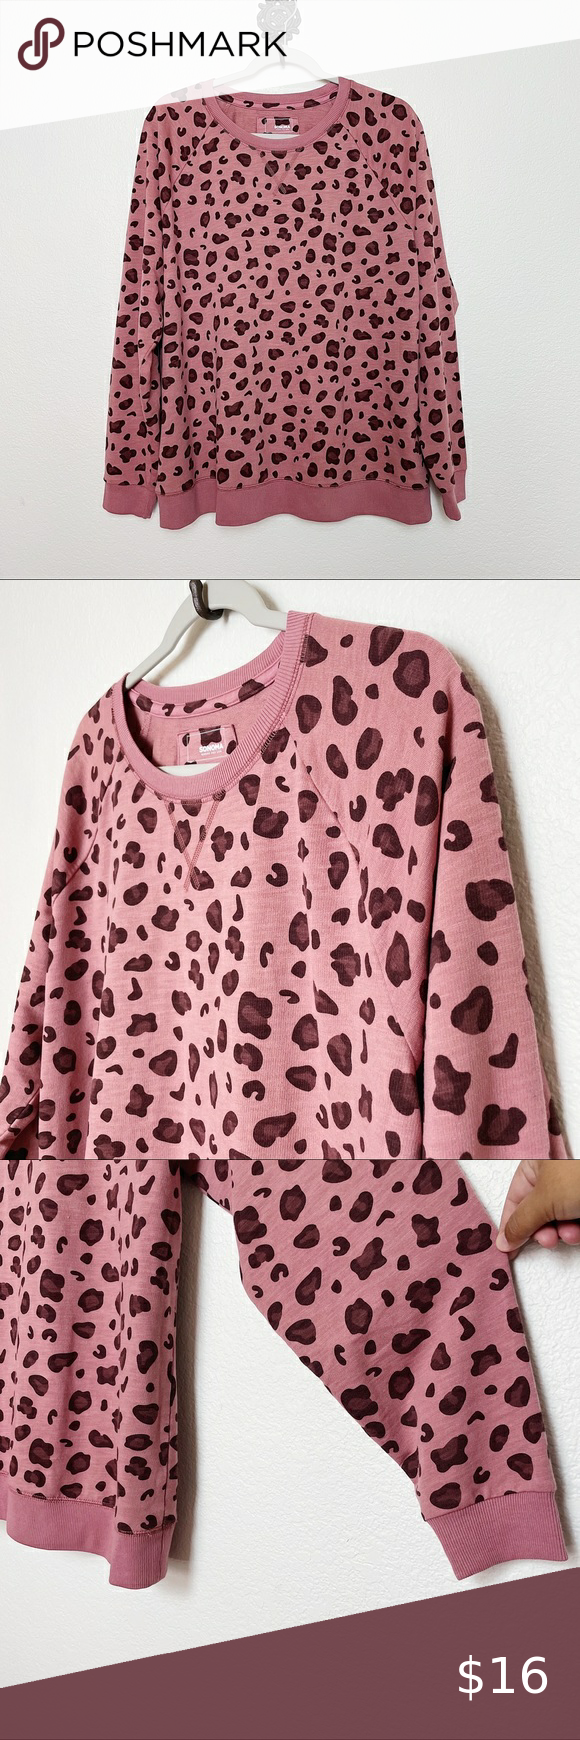 Sonoma Pink Leopard Print Crewneck Sweatshirt Xxl Pink Leopard Print Crew Neck Sweatshirt Pink Leopard [ 1740 x 580 Pixel ]